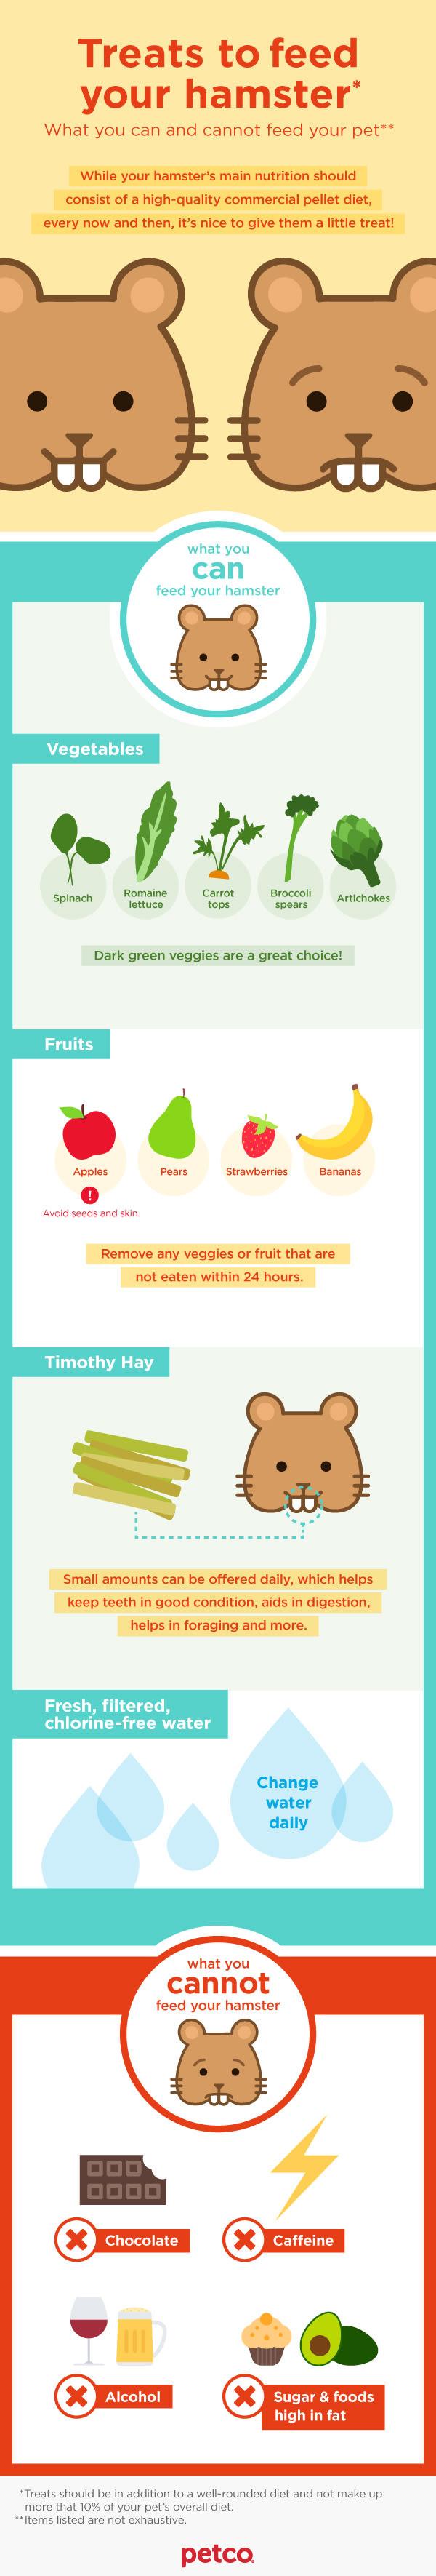 HamsterTreat-Infographic.jpg